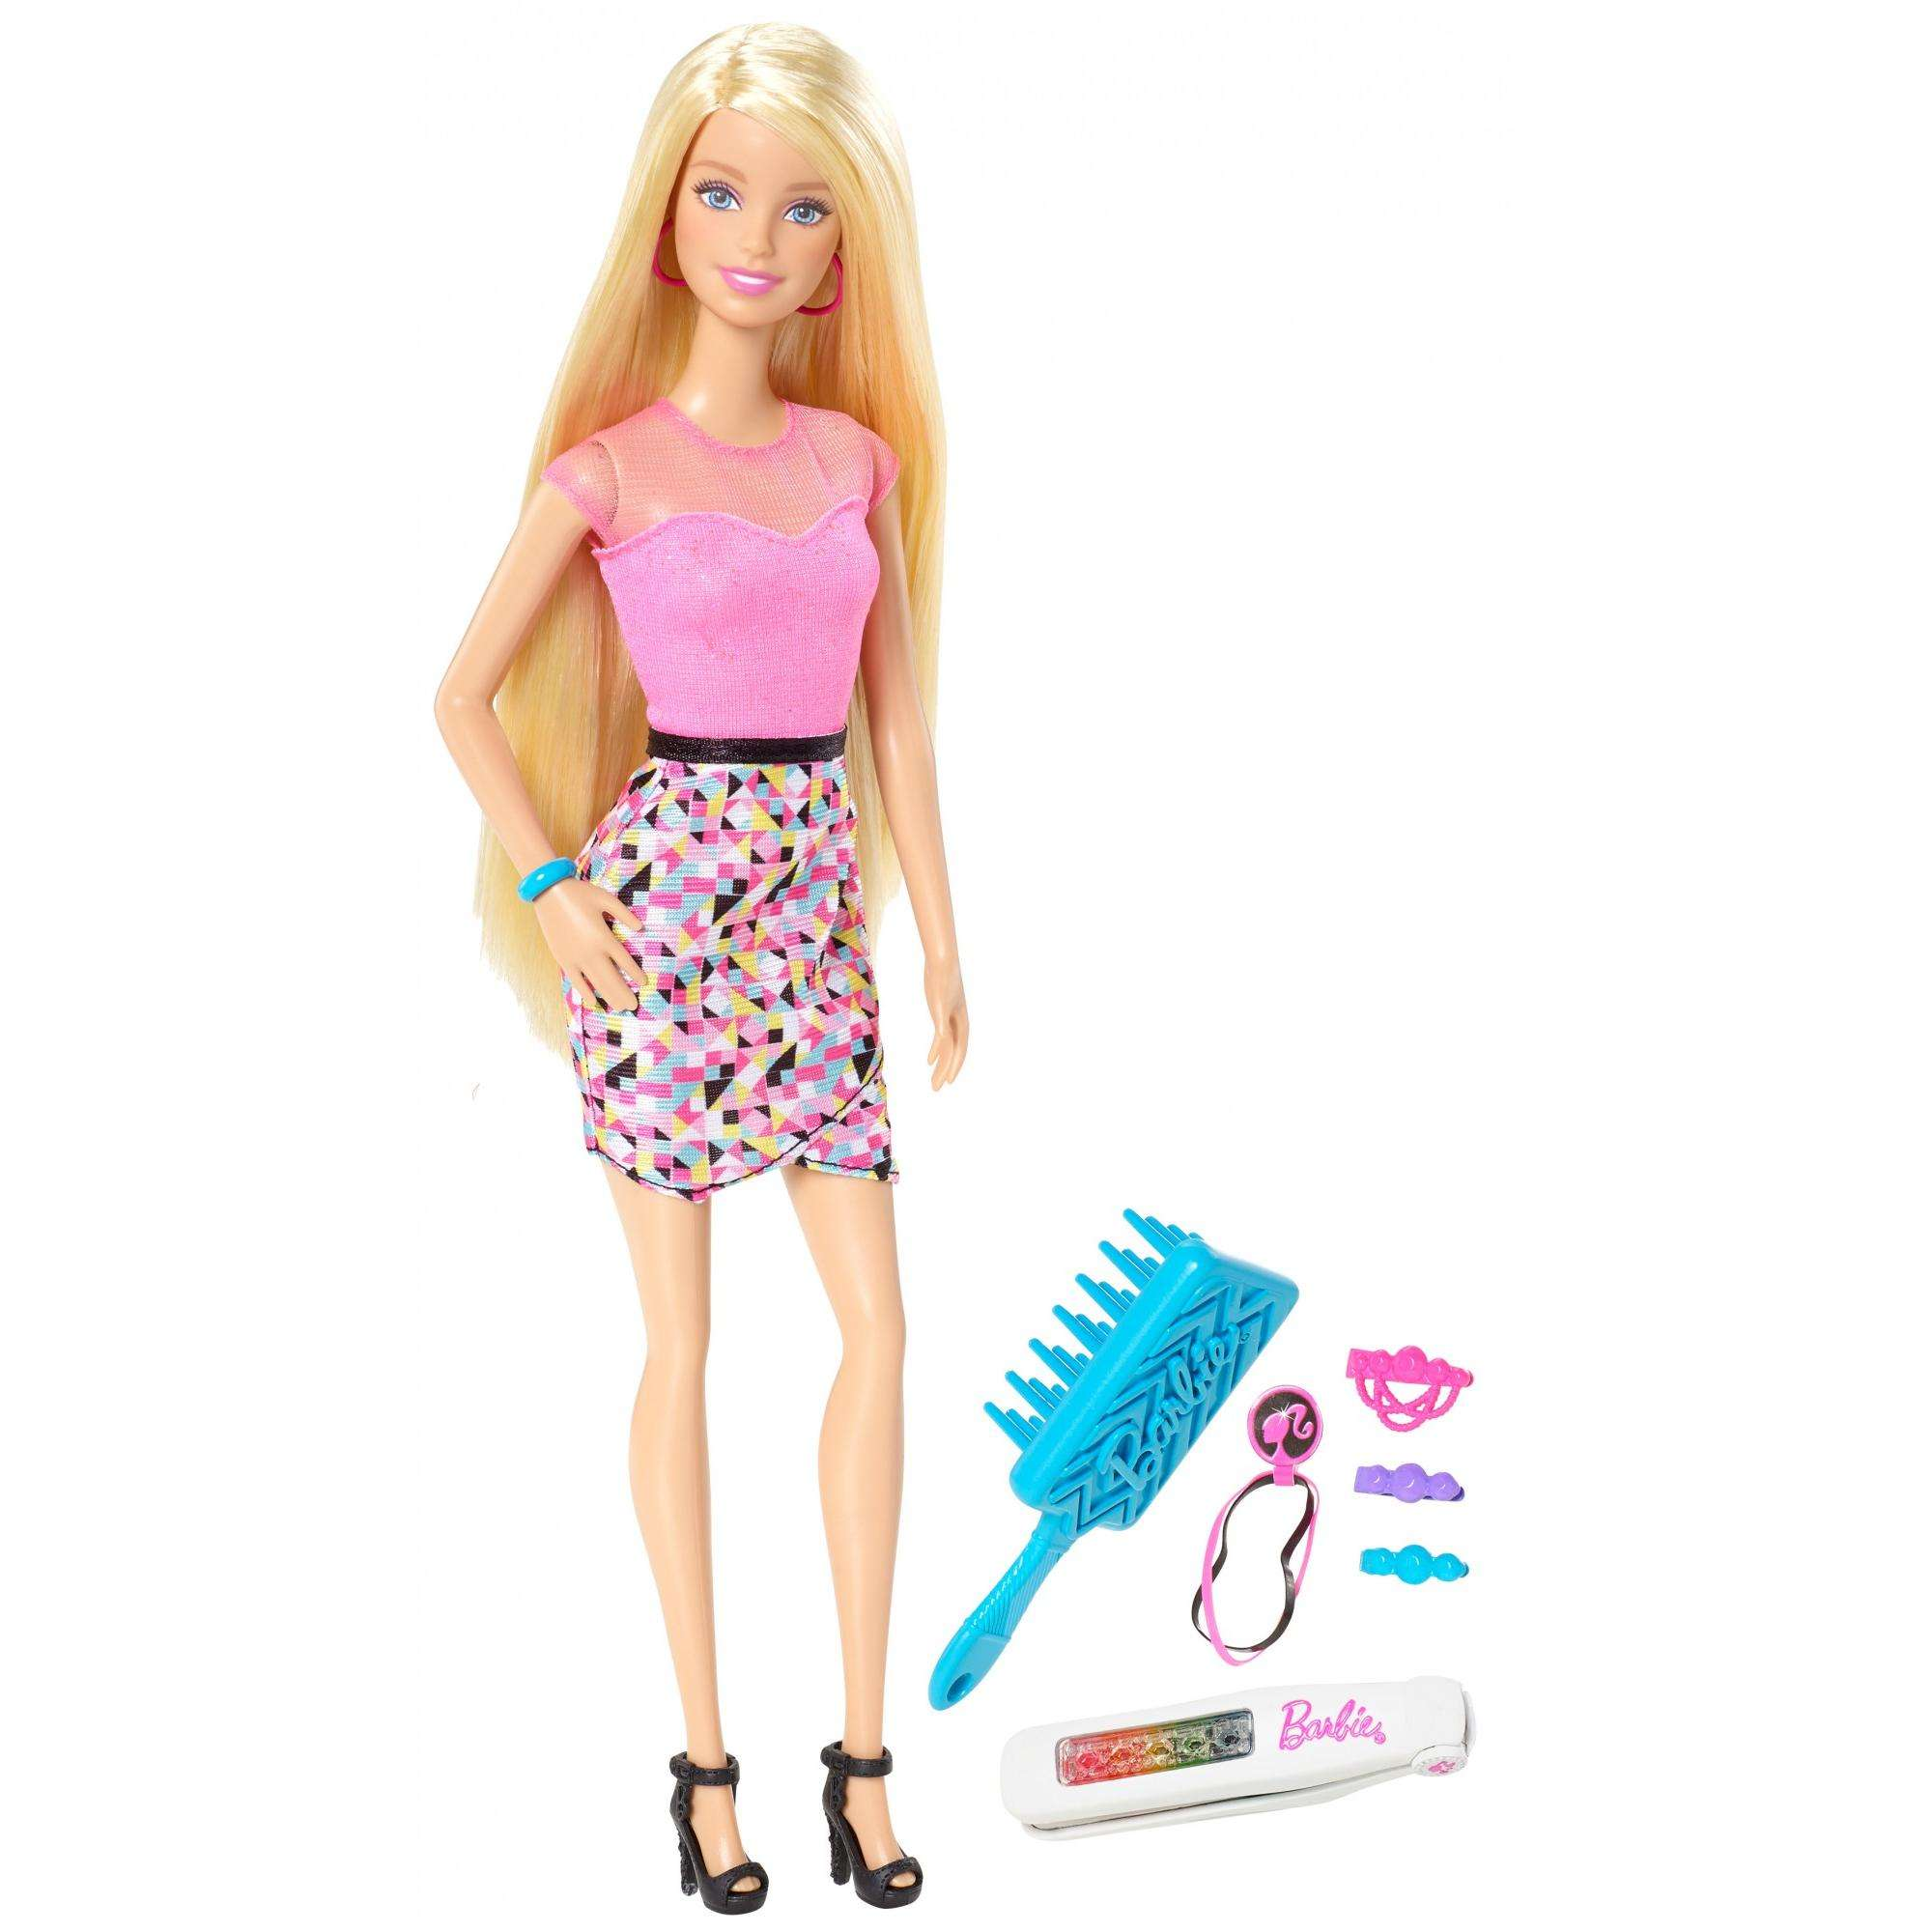 Barbie Rainbow Hair Doll - Blonde